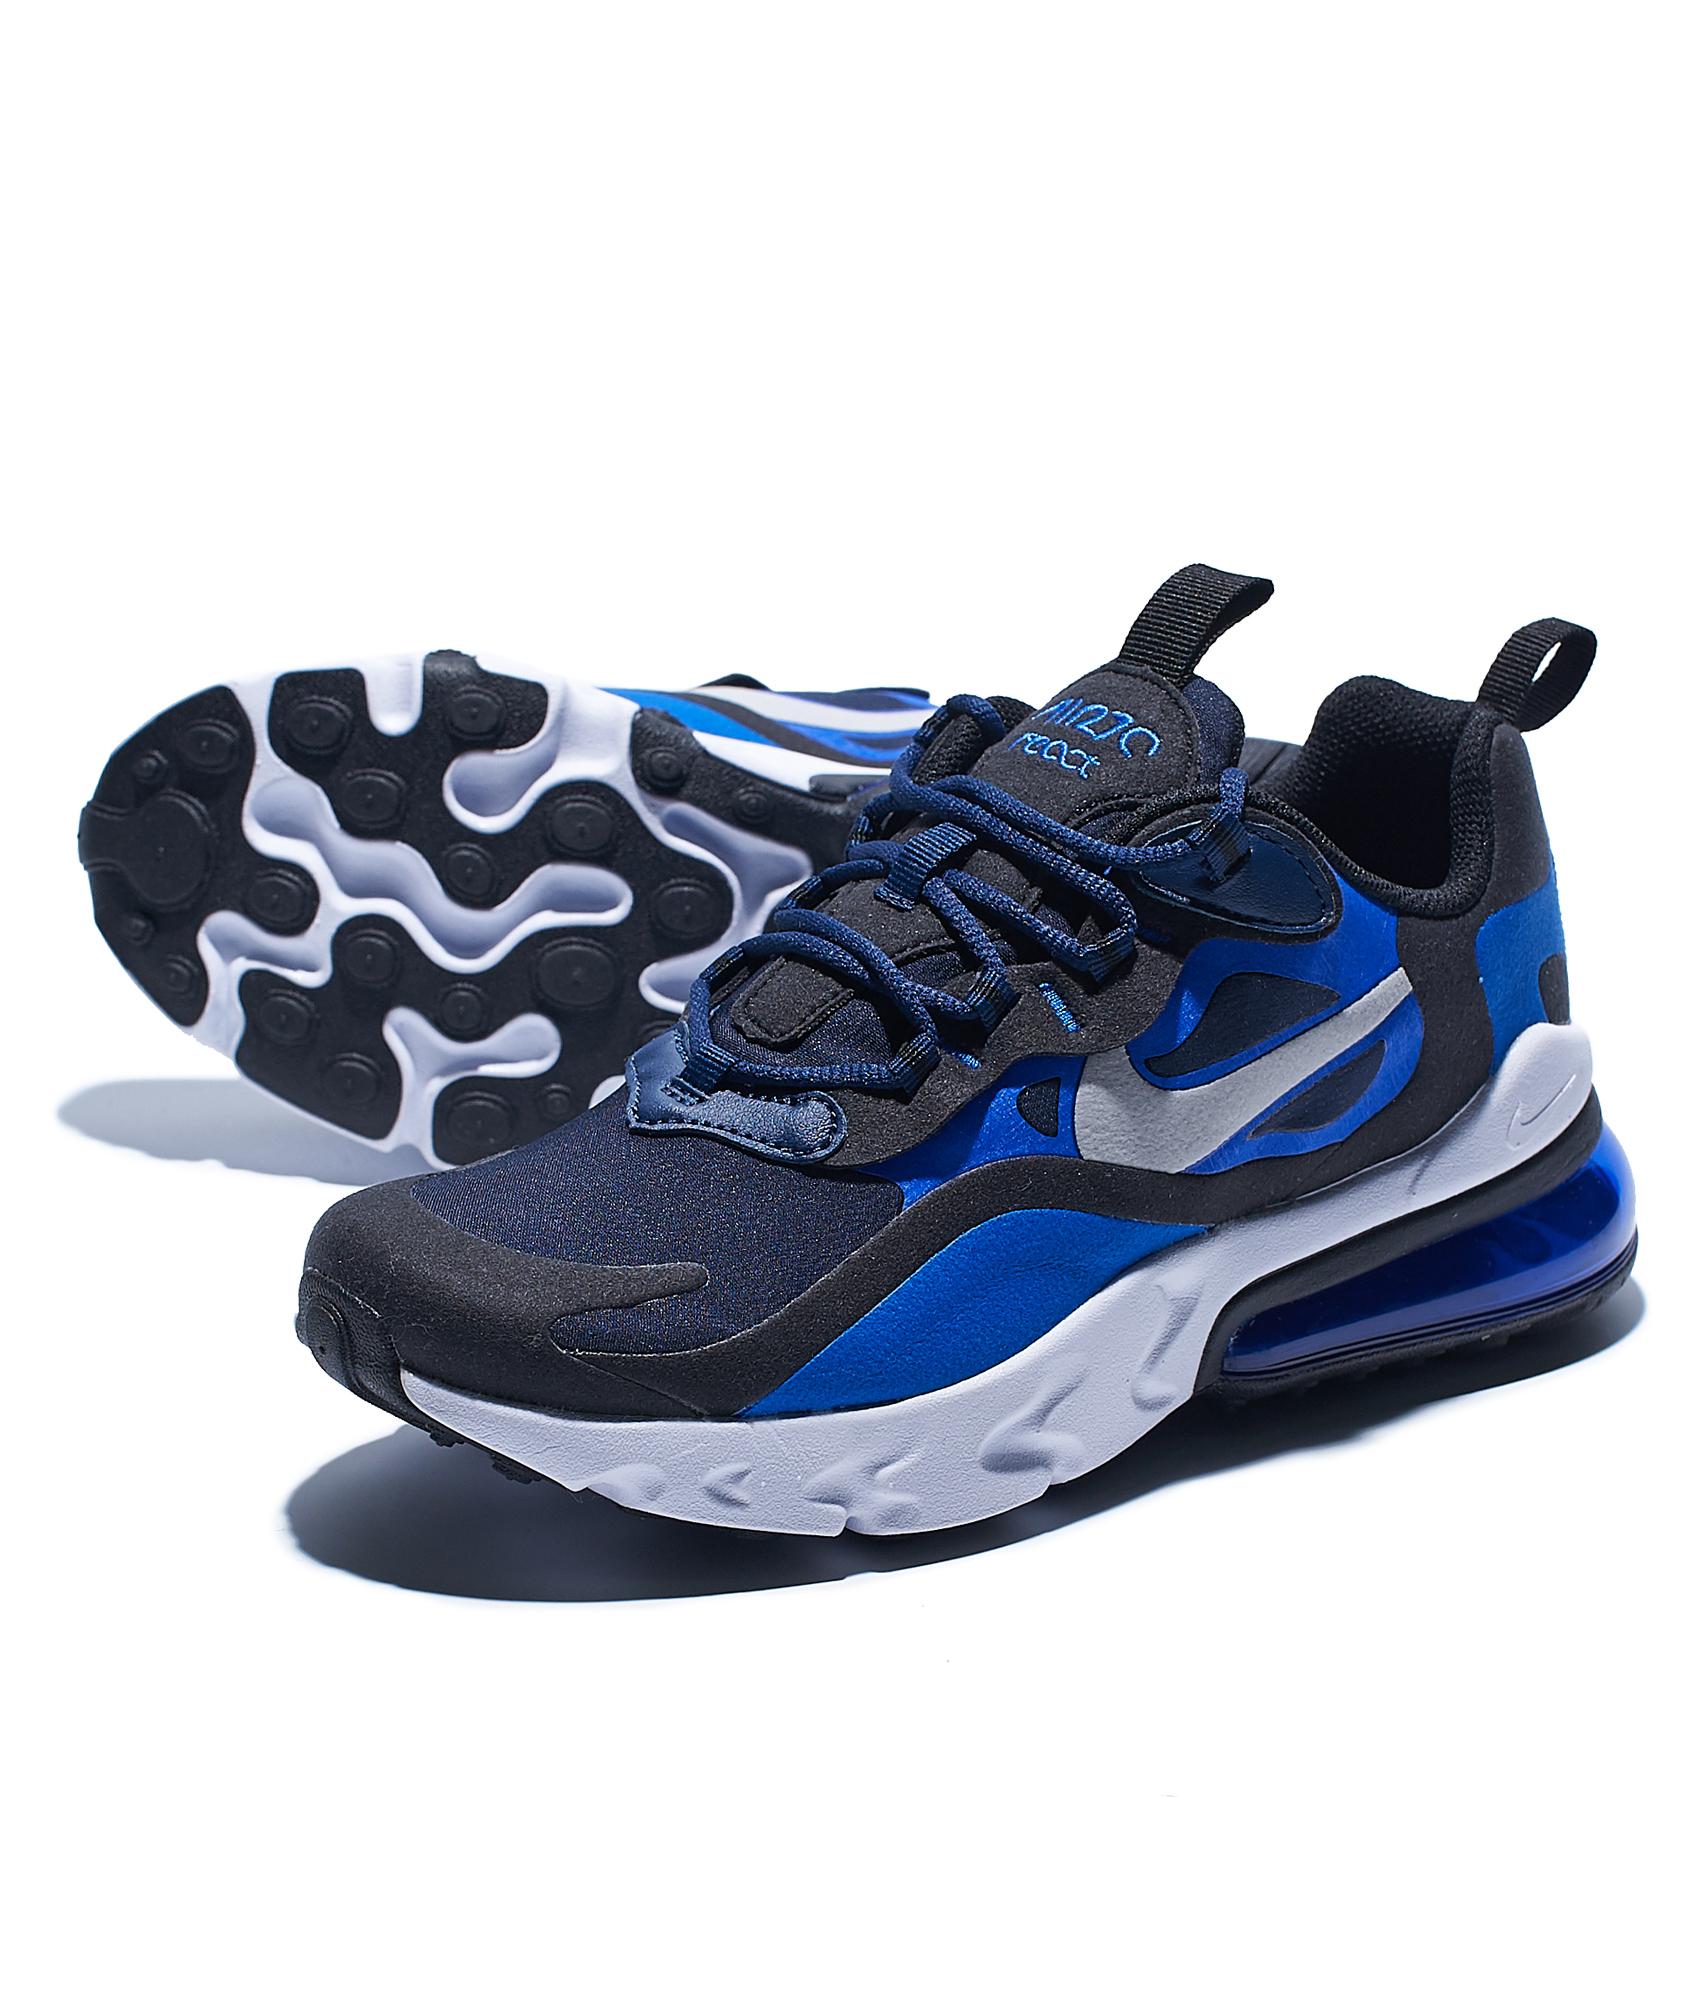 Кроссовки подростковые Nike Air Max 270 React GS Nike